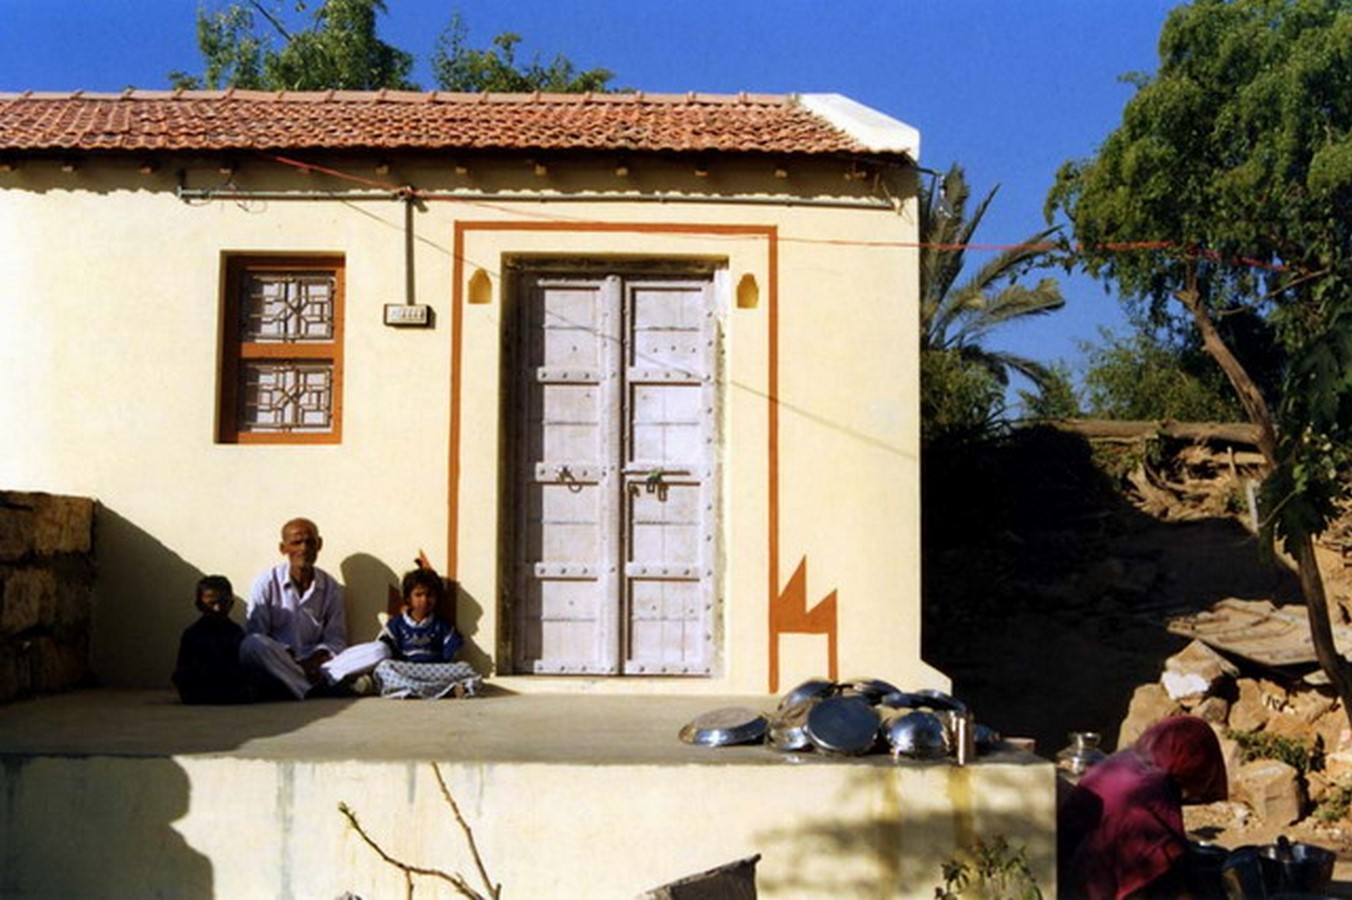 Rehabilitation of Bhadli Village of Bhuj by Brinda Somaya: A Ray of Hope - Sheet2